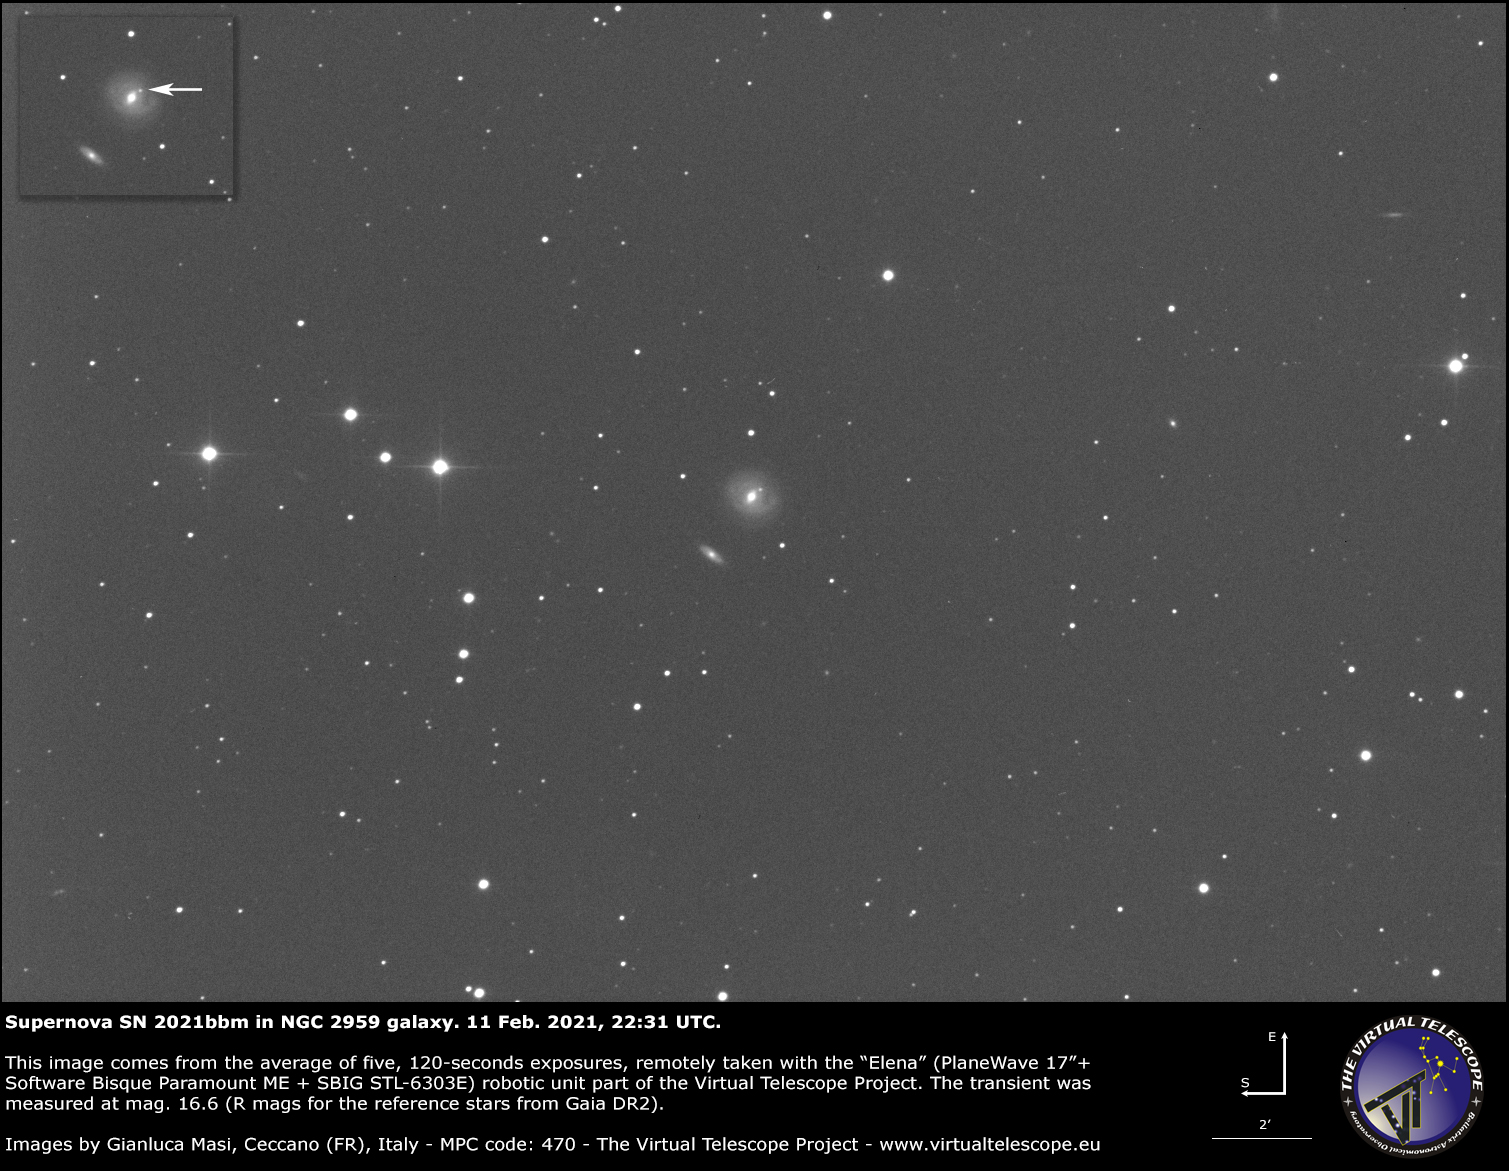 Supernova SN 2021bbm in NGC 2959 galaxy: 11 Feb. 2021.